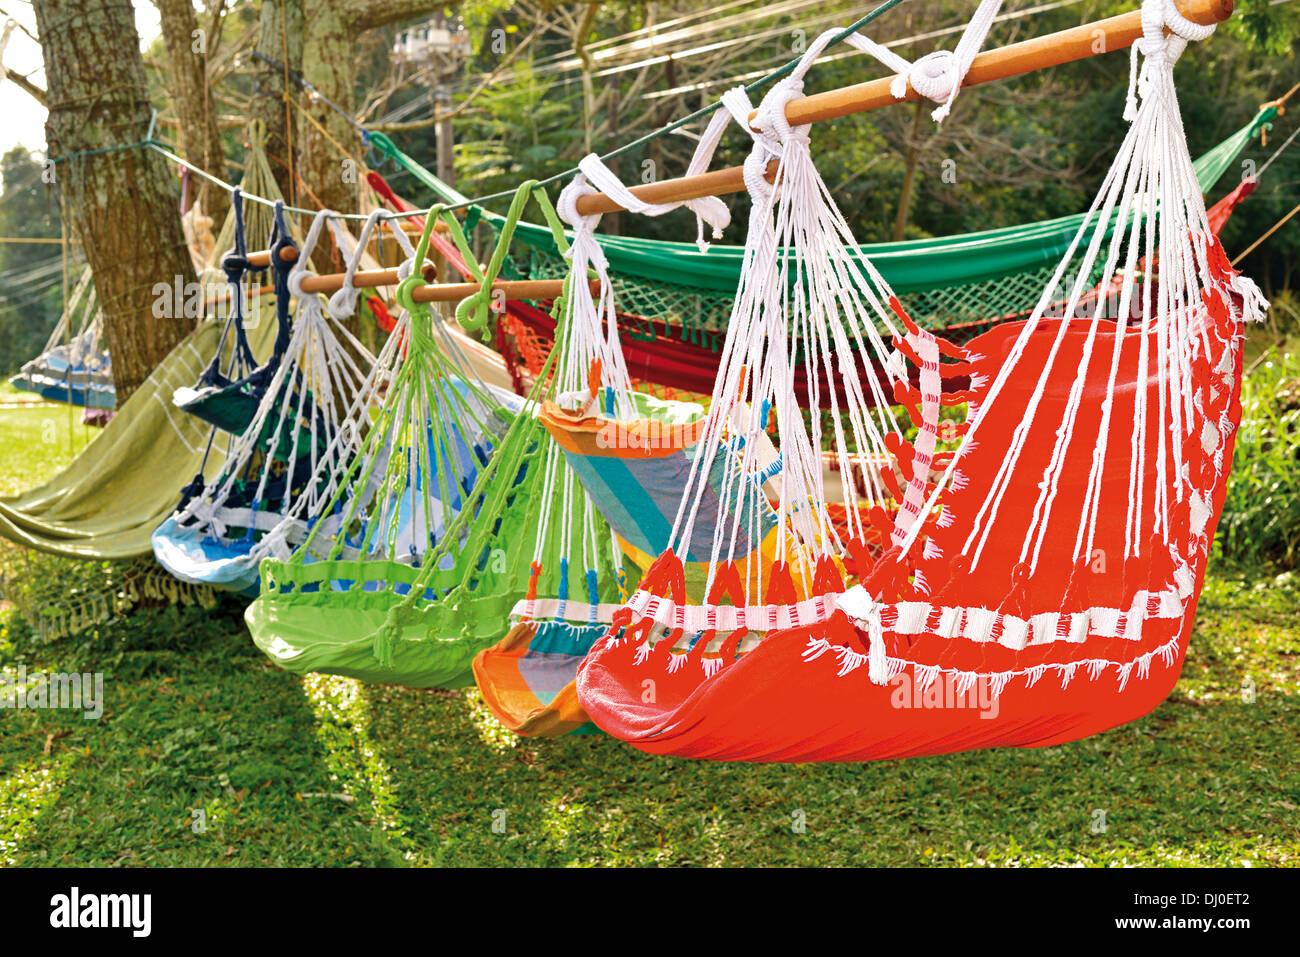 brazil iguassu national park  colorful hammocks along the street for sale as souvenirs brazil iguassu national park  colorful hammocks along the street      rh   alamy